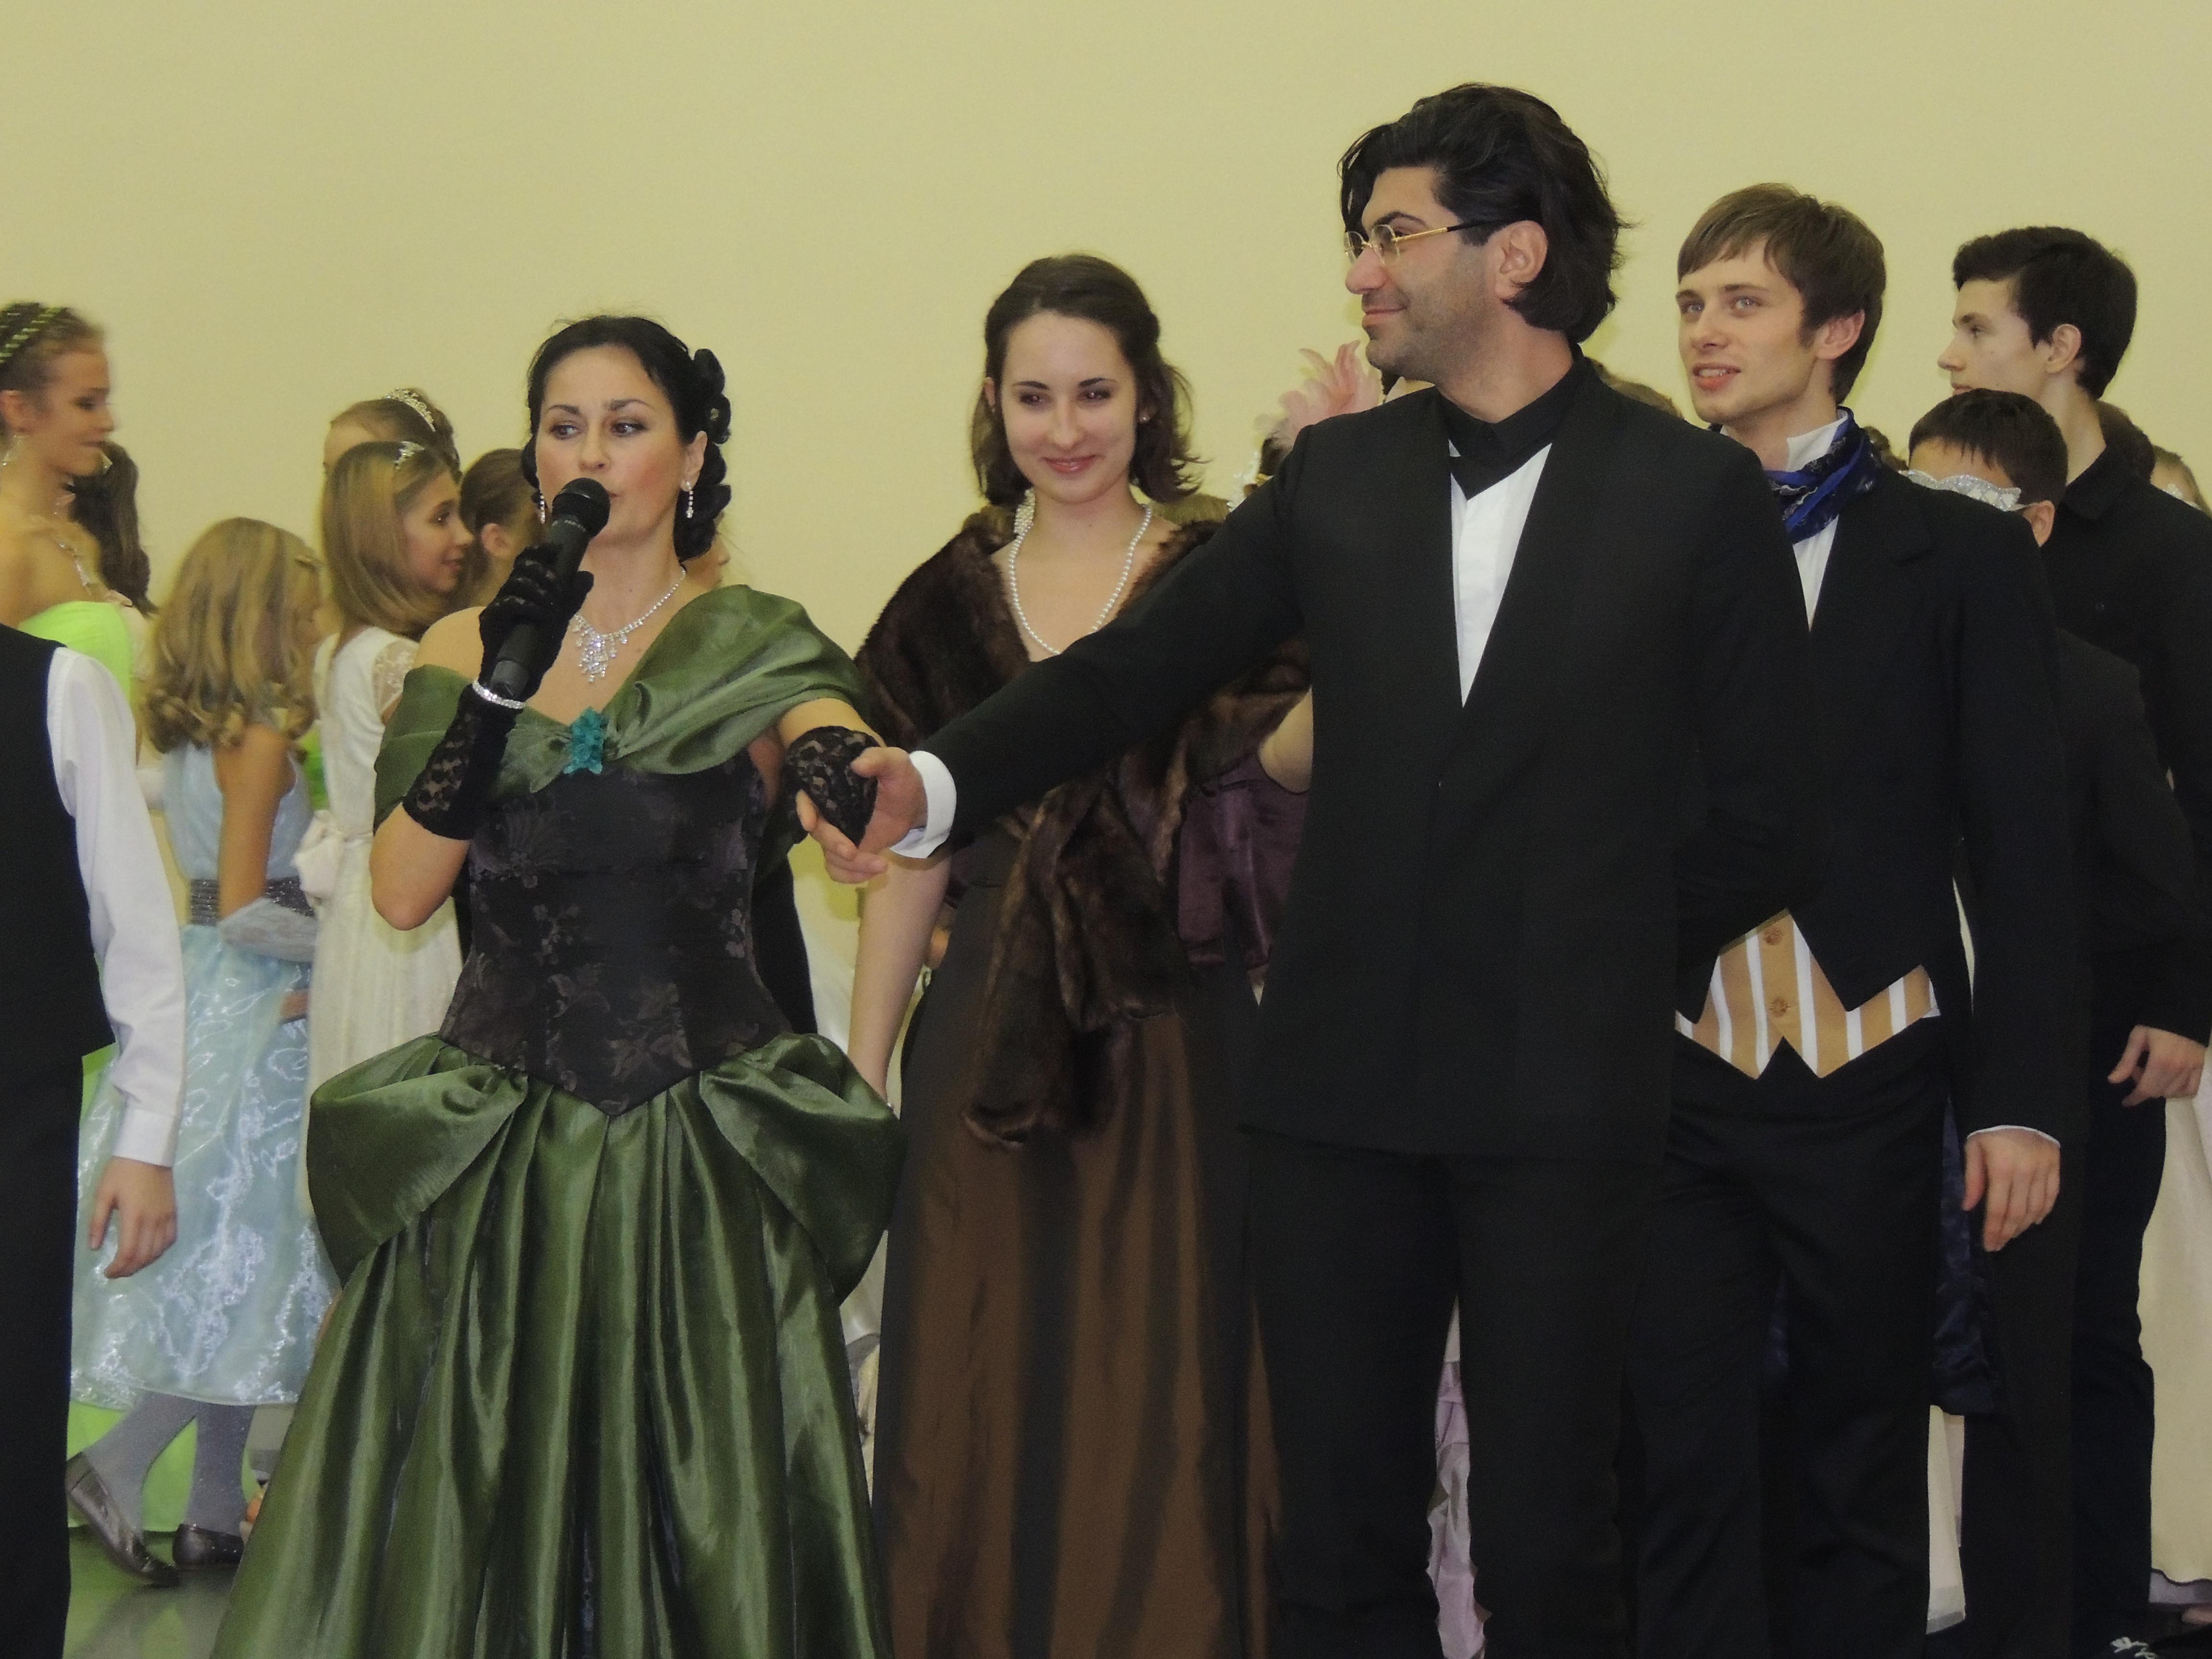 Николай Цискаридзе на Рождественском балу в Академии